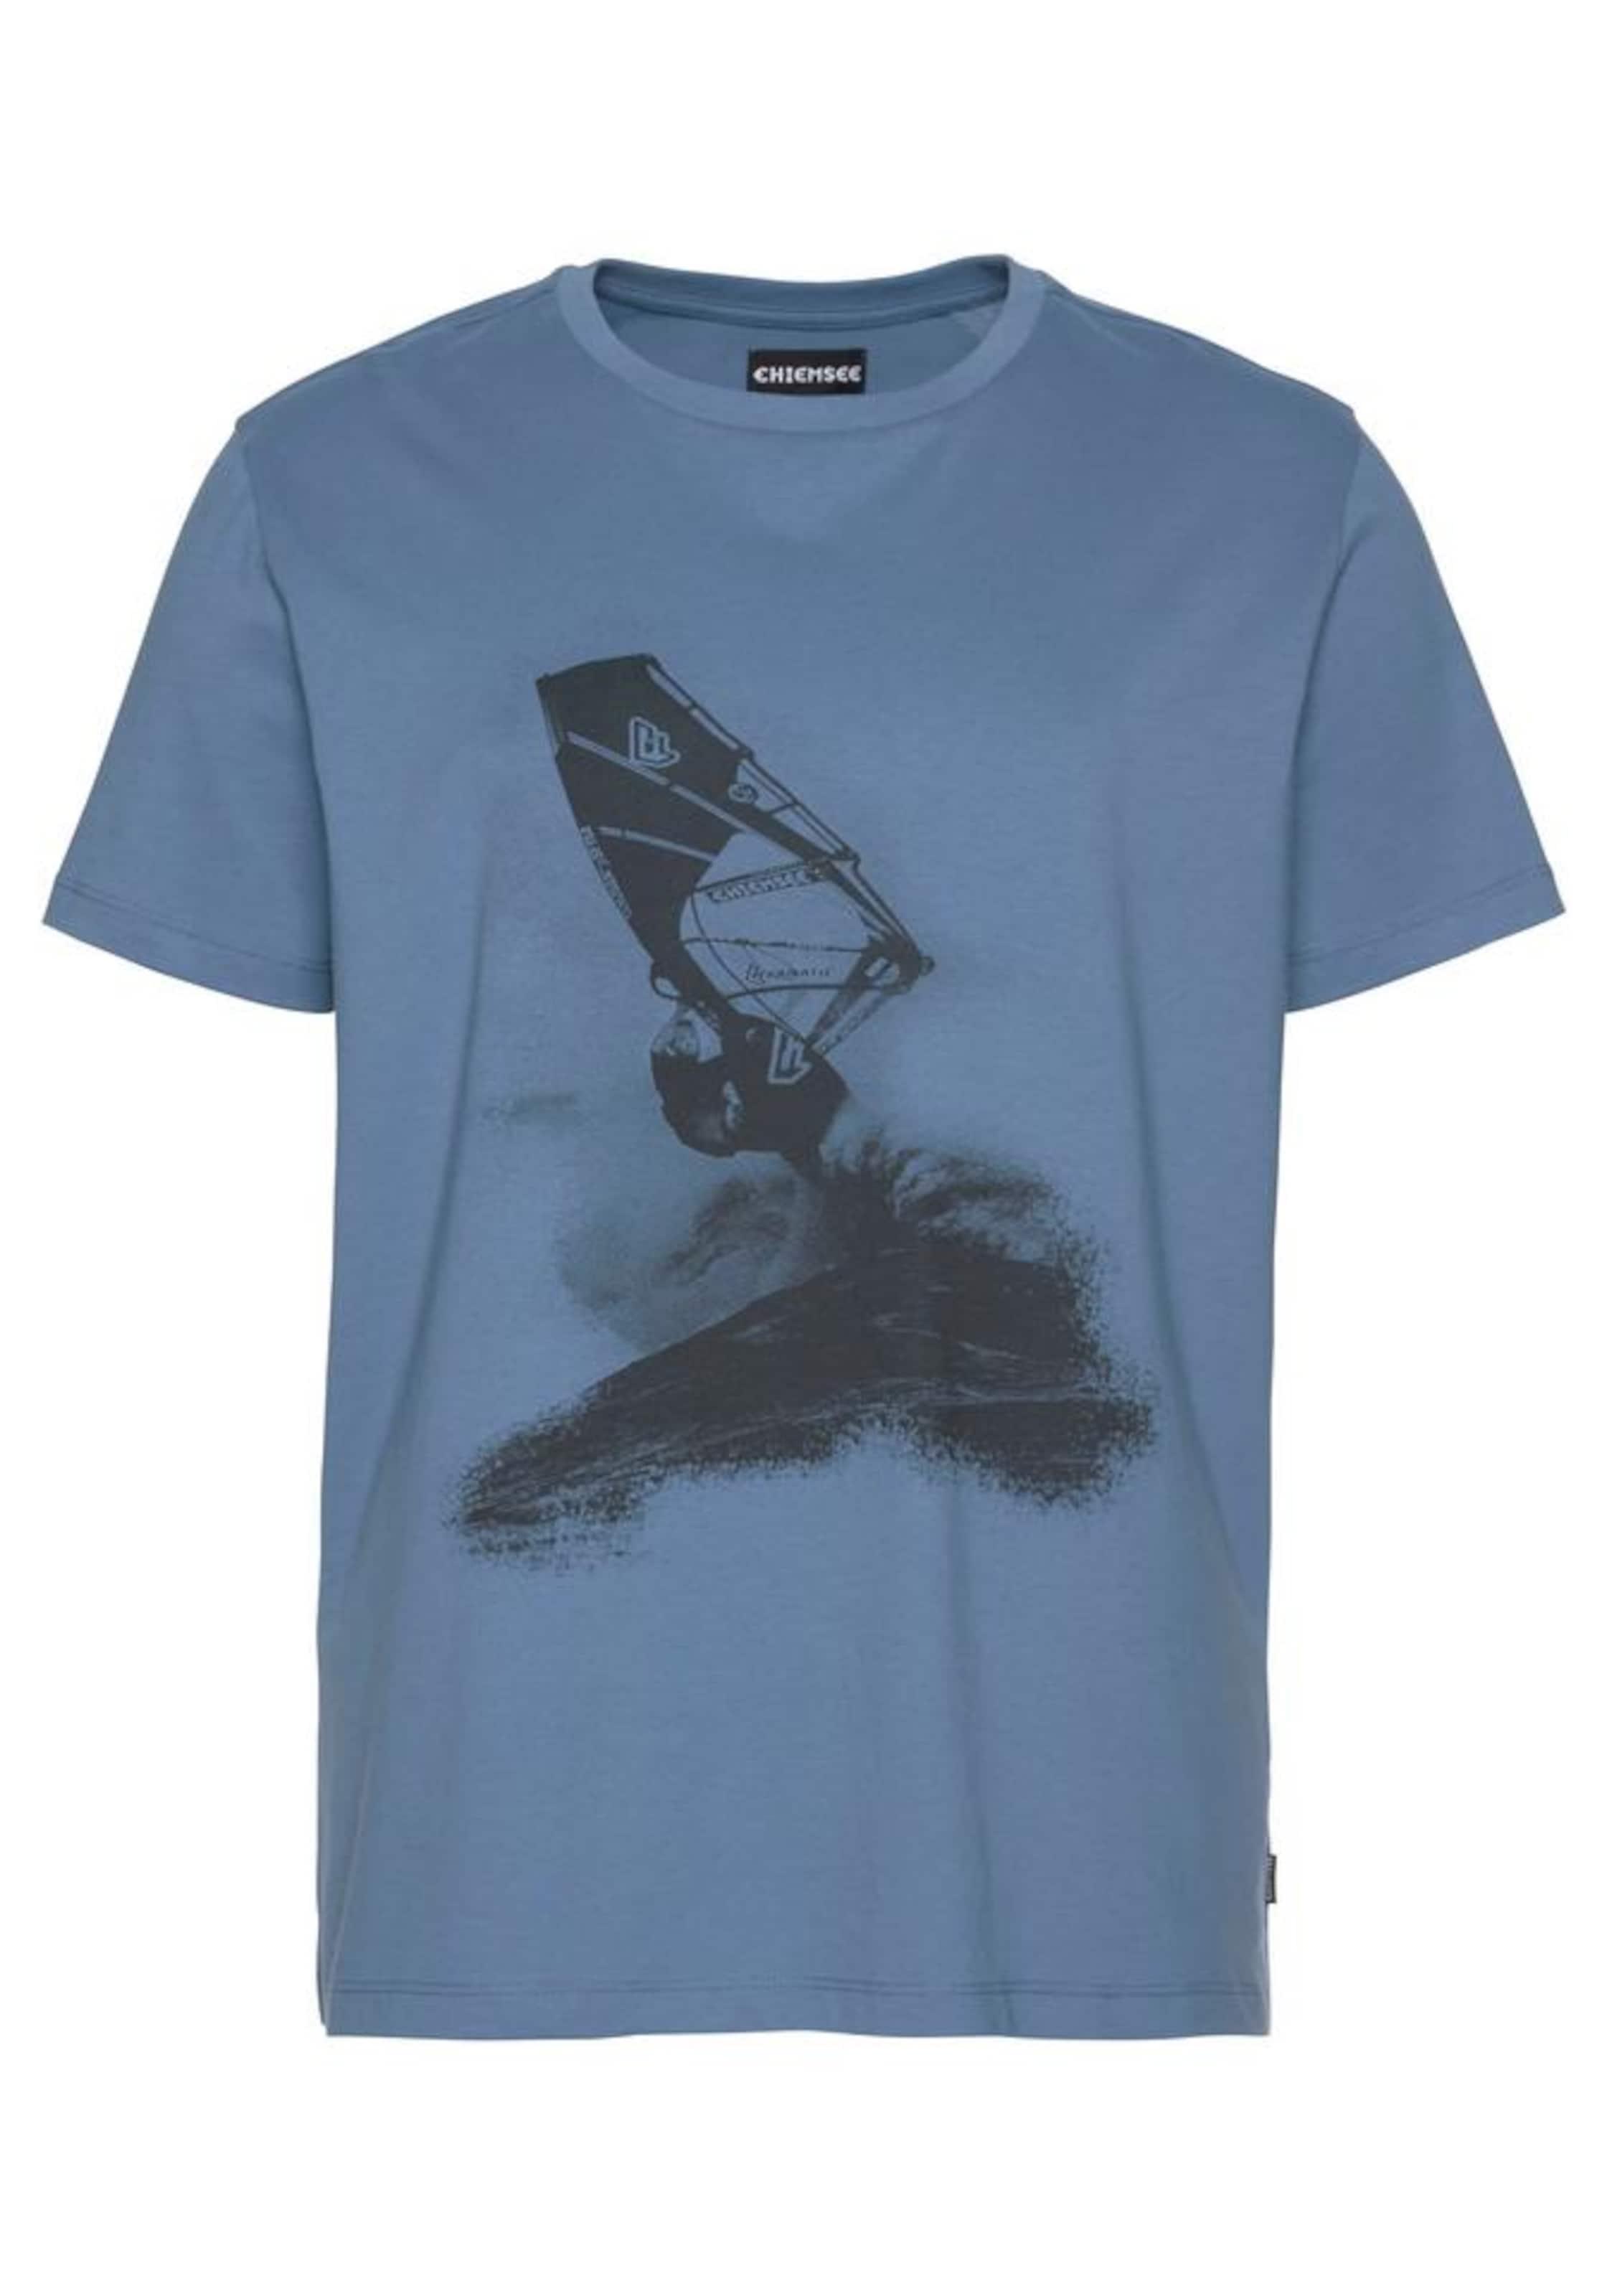 In TaubenblauSchwarz T In shirt Chiemsee TaubenblauSchwarz T shirt shirt Chiemsee In Chiemsee T W2ID9HEY